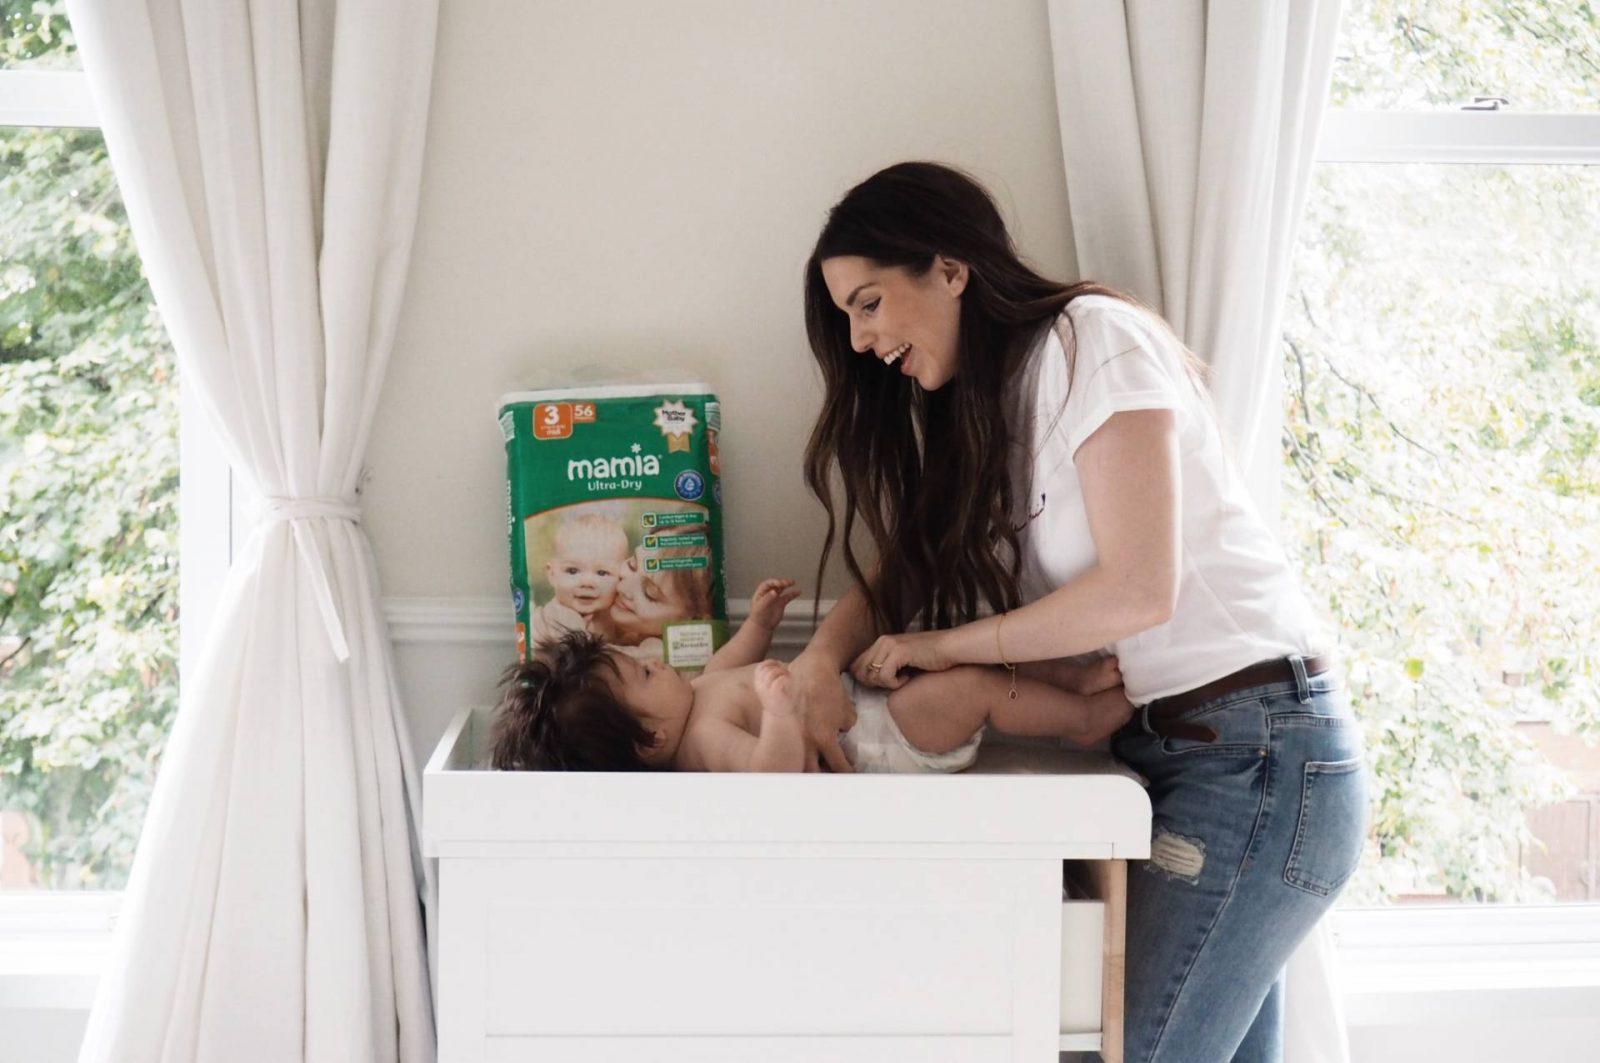 Aldi's Baby & Toddler Discounts Event Returns